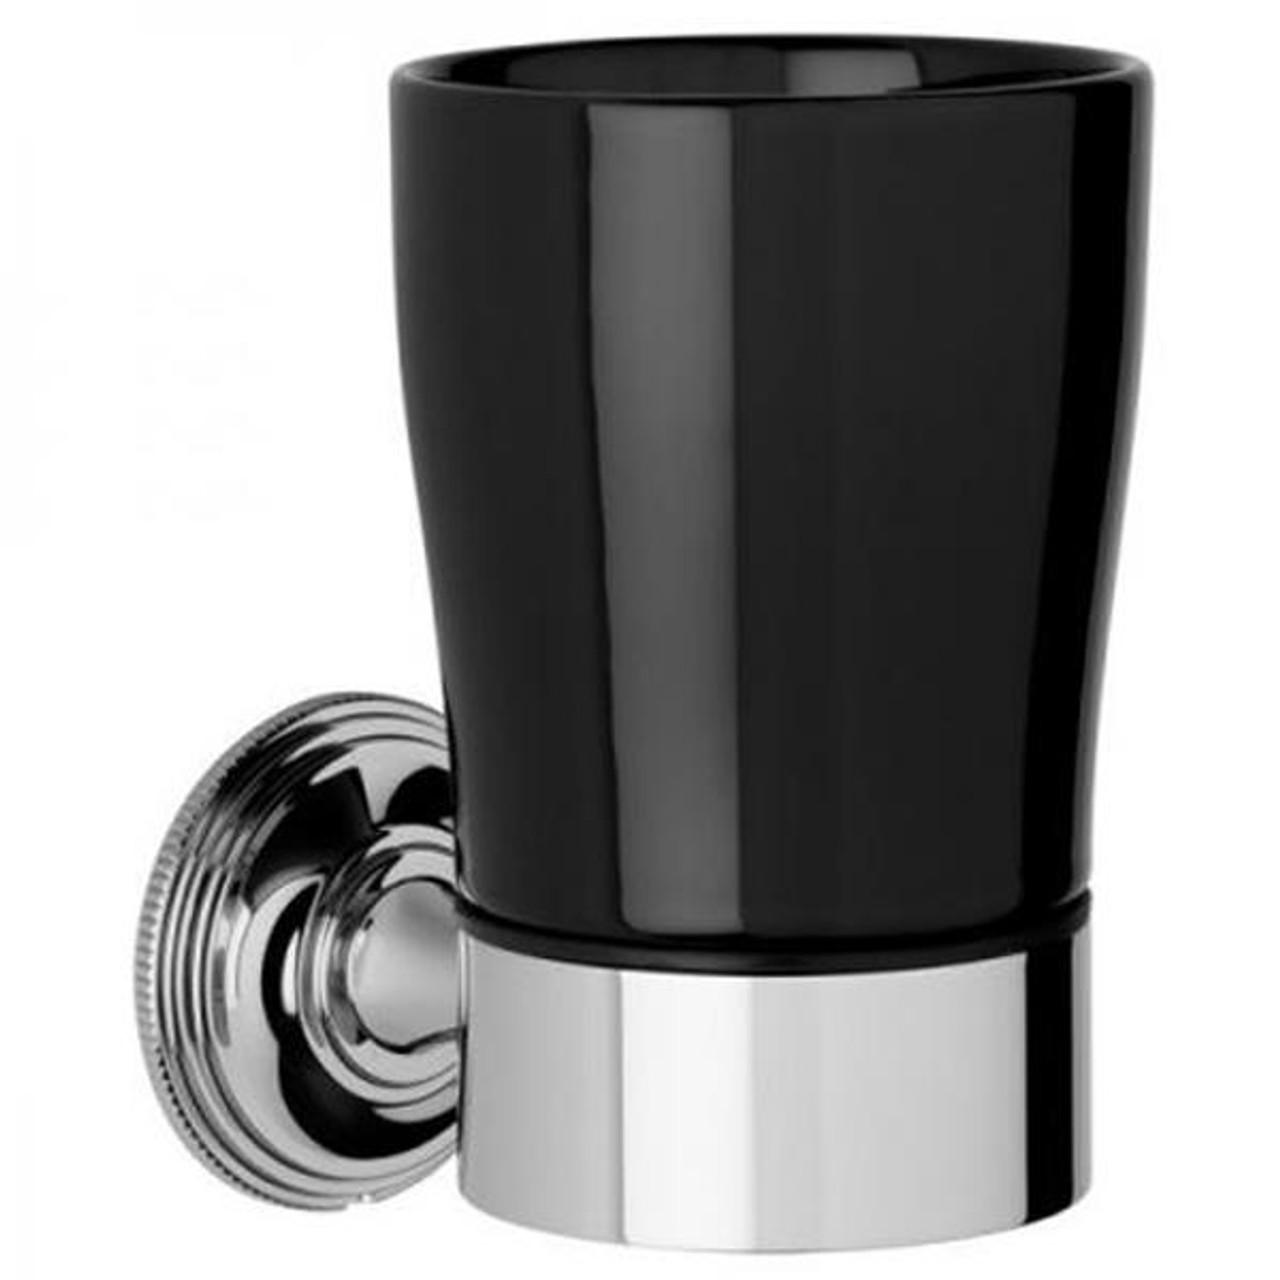 Chrome Plated Samuel Heath Style Moderne Tumbler Holder Black Ceramic N6635B